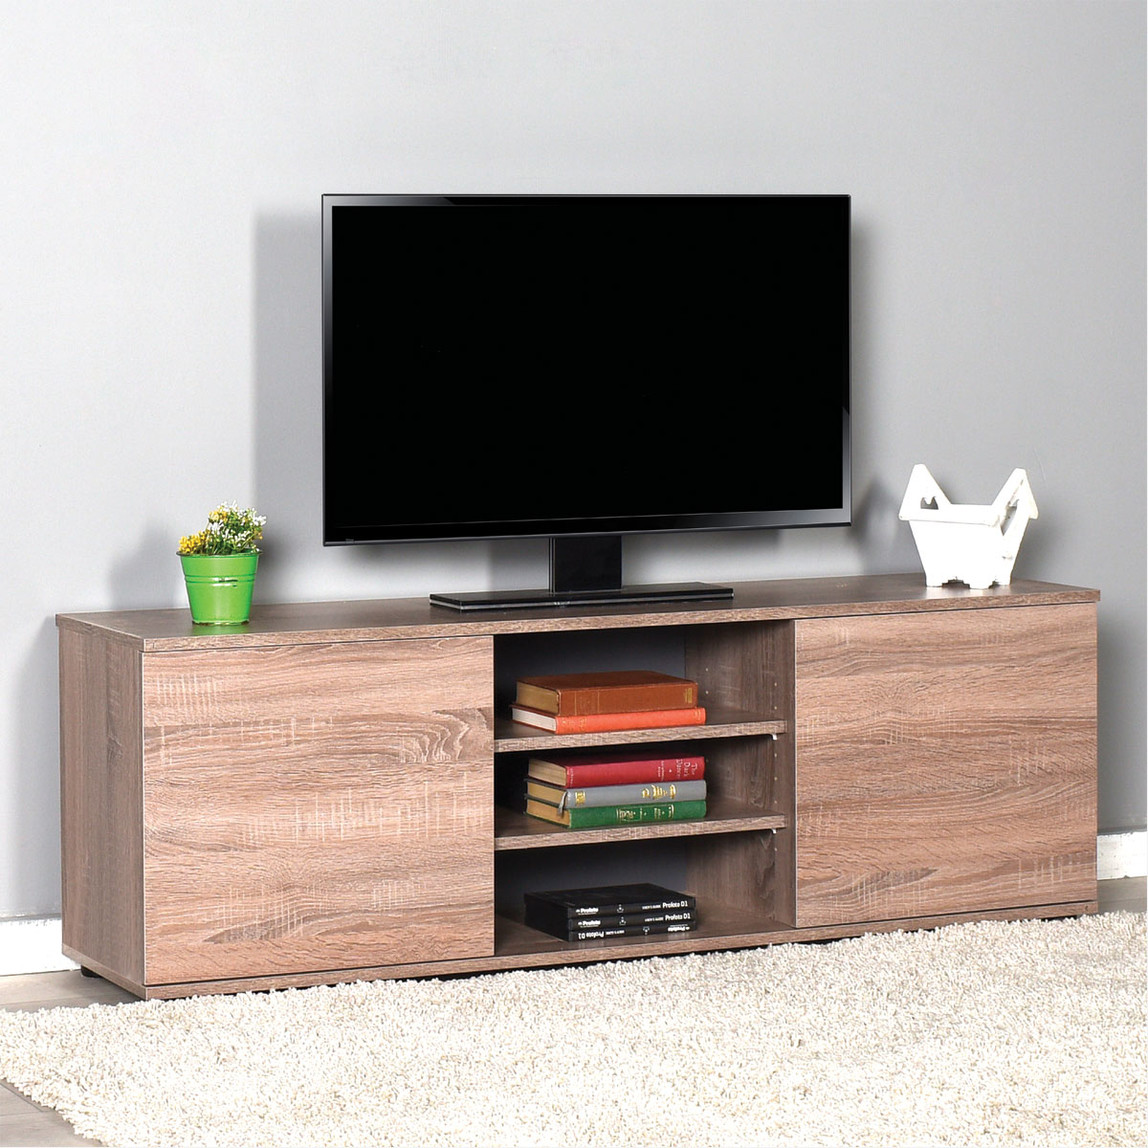 Flat Line Max 2 Kapaklı Tv Sehpası